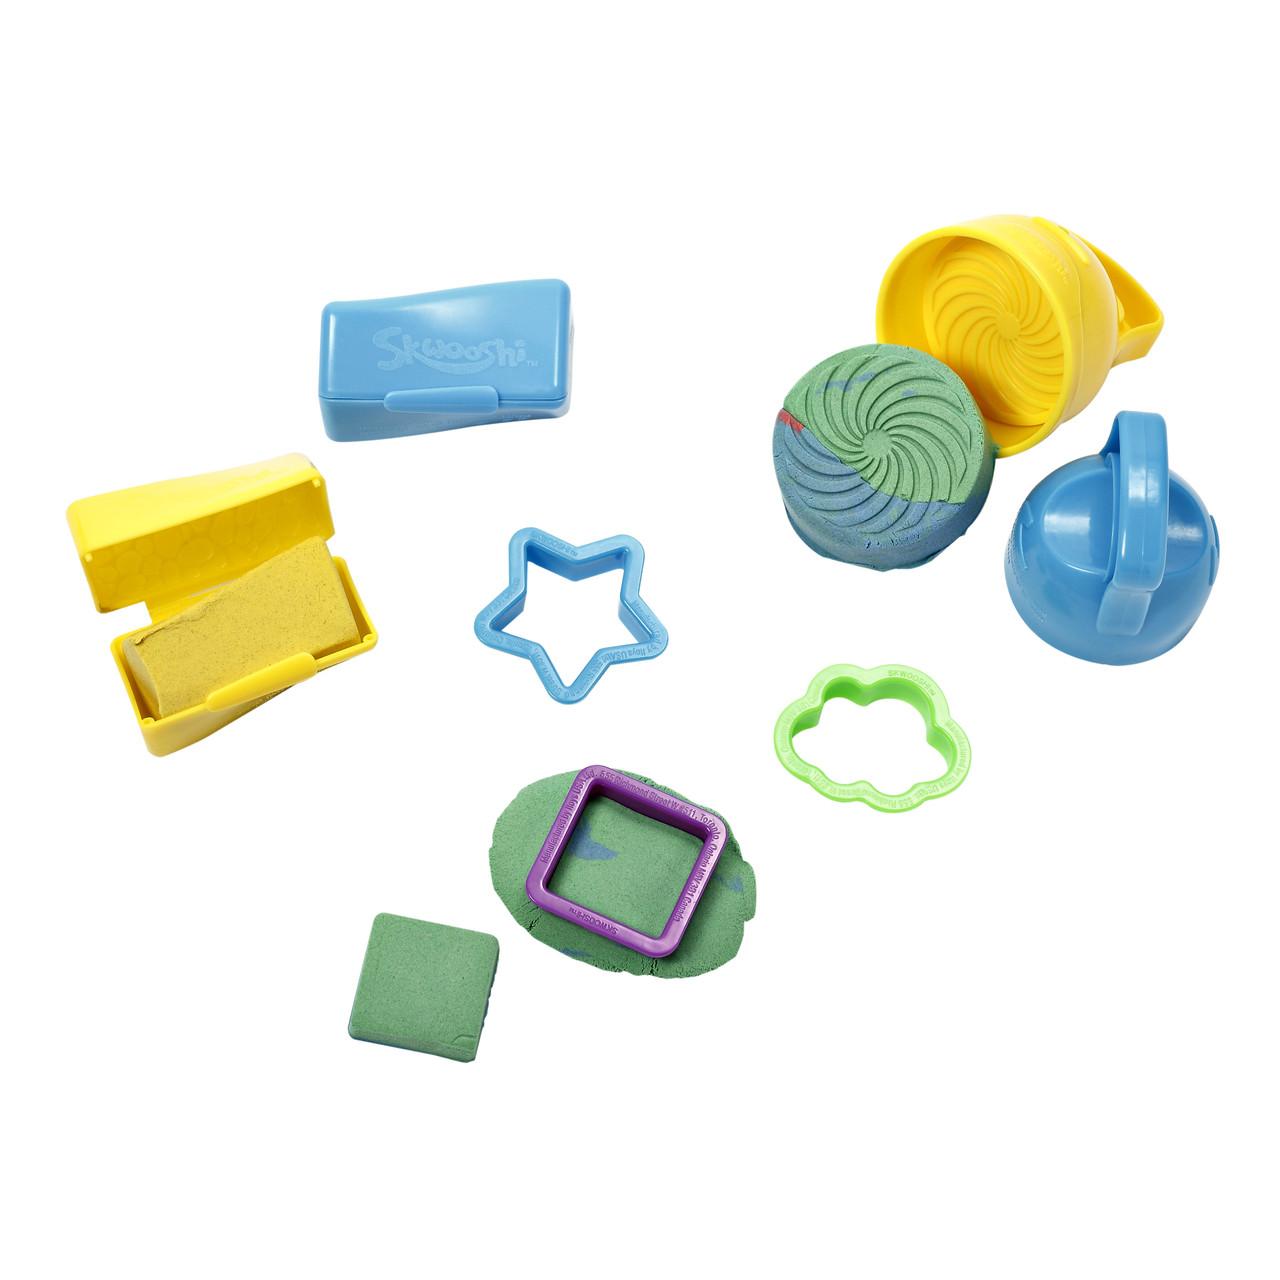 Творчество и рукоделие «Irwin Toy» (30008) набор для лепки «Skwooshi» со смешивателем цветов